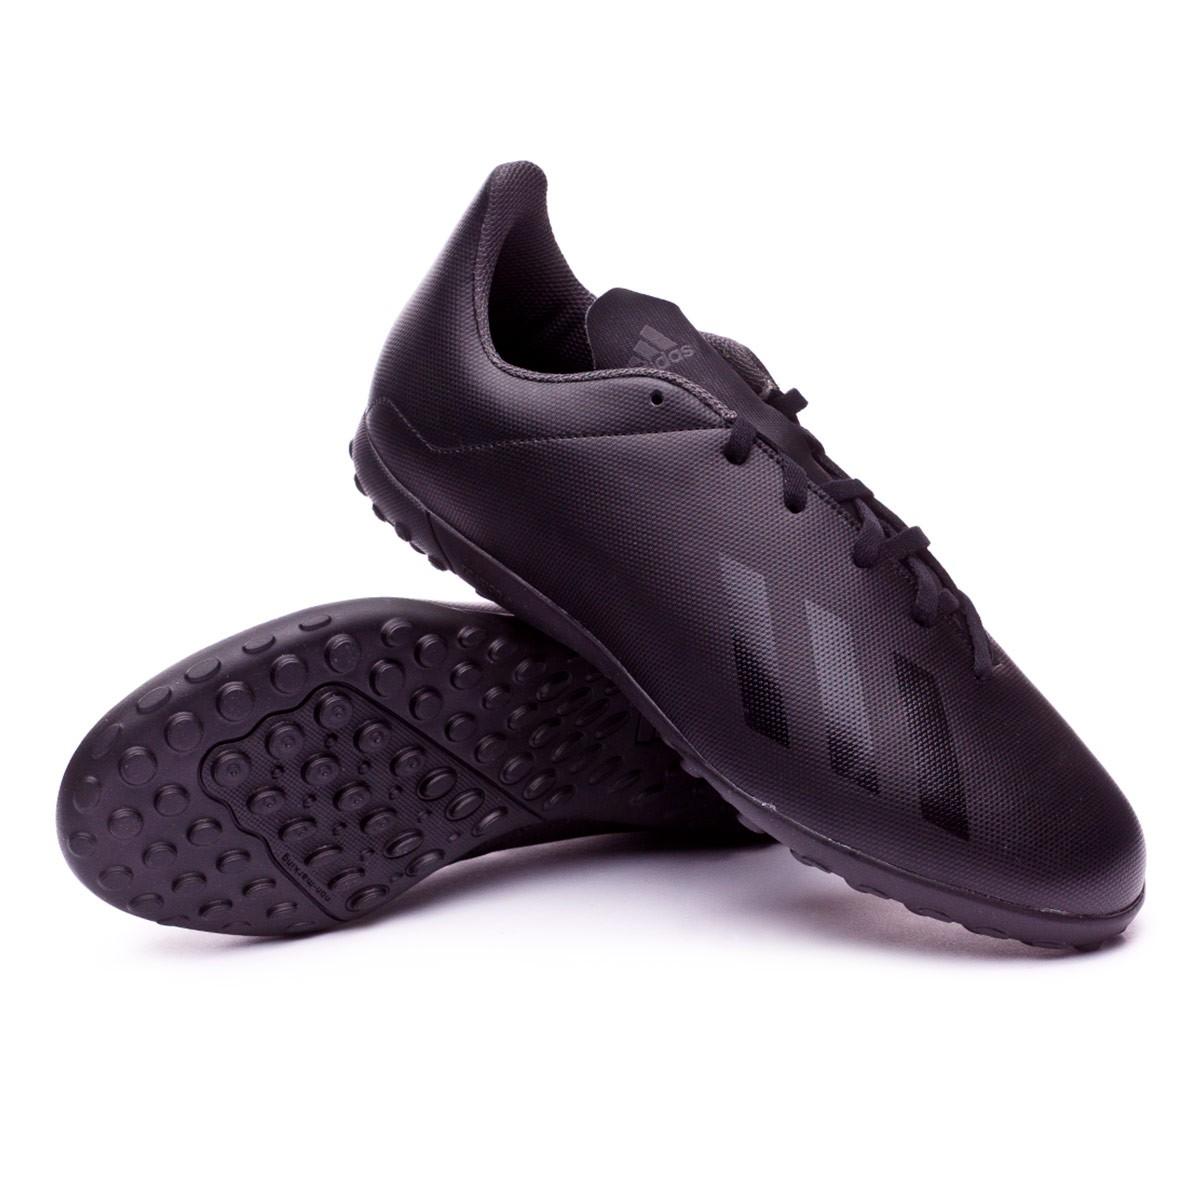 d5b7a3f3946 Football Boot adidas Kids X Tango 18.4 Turf Core black-White ...